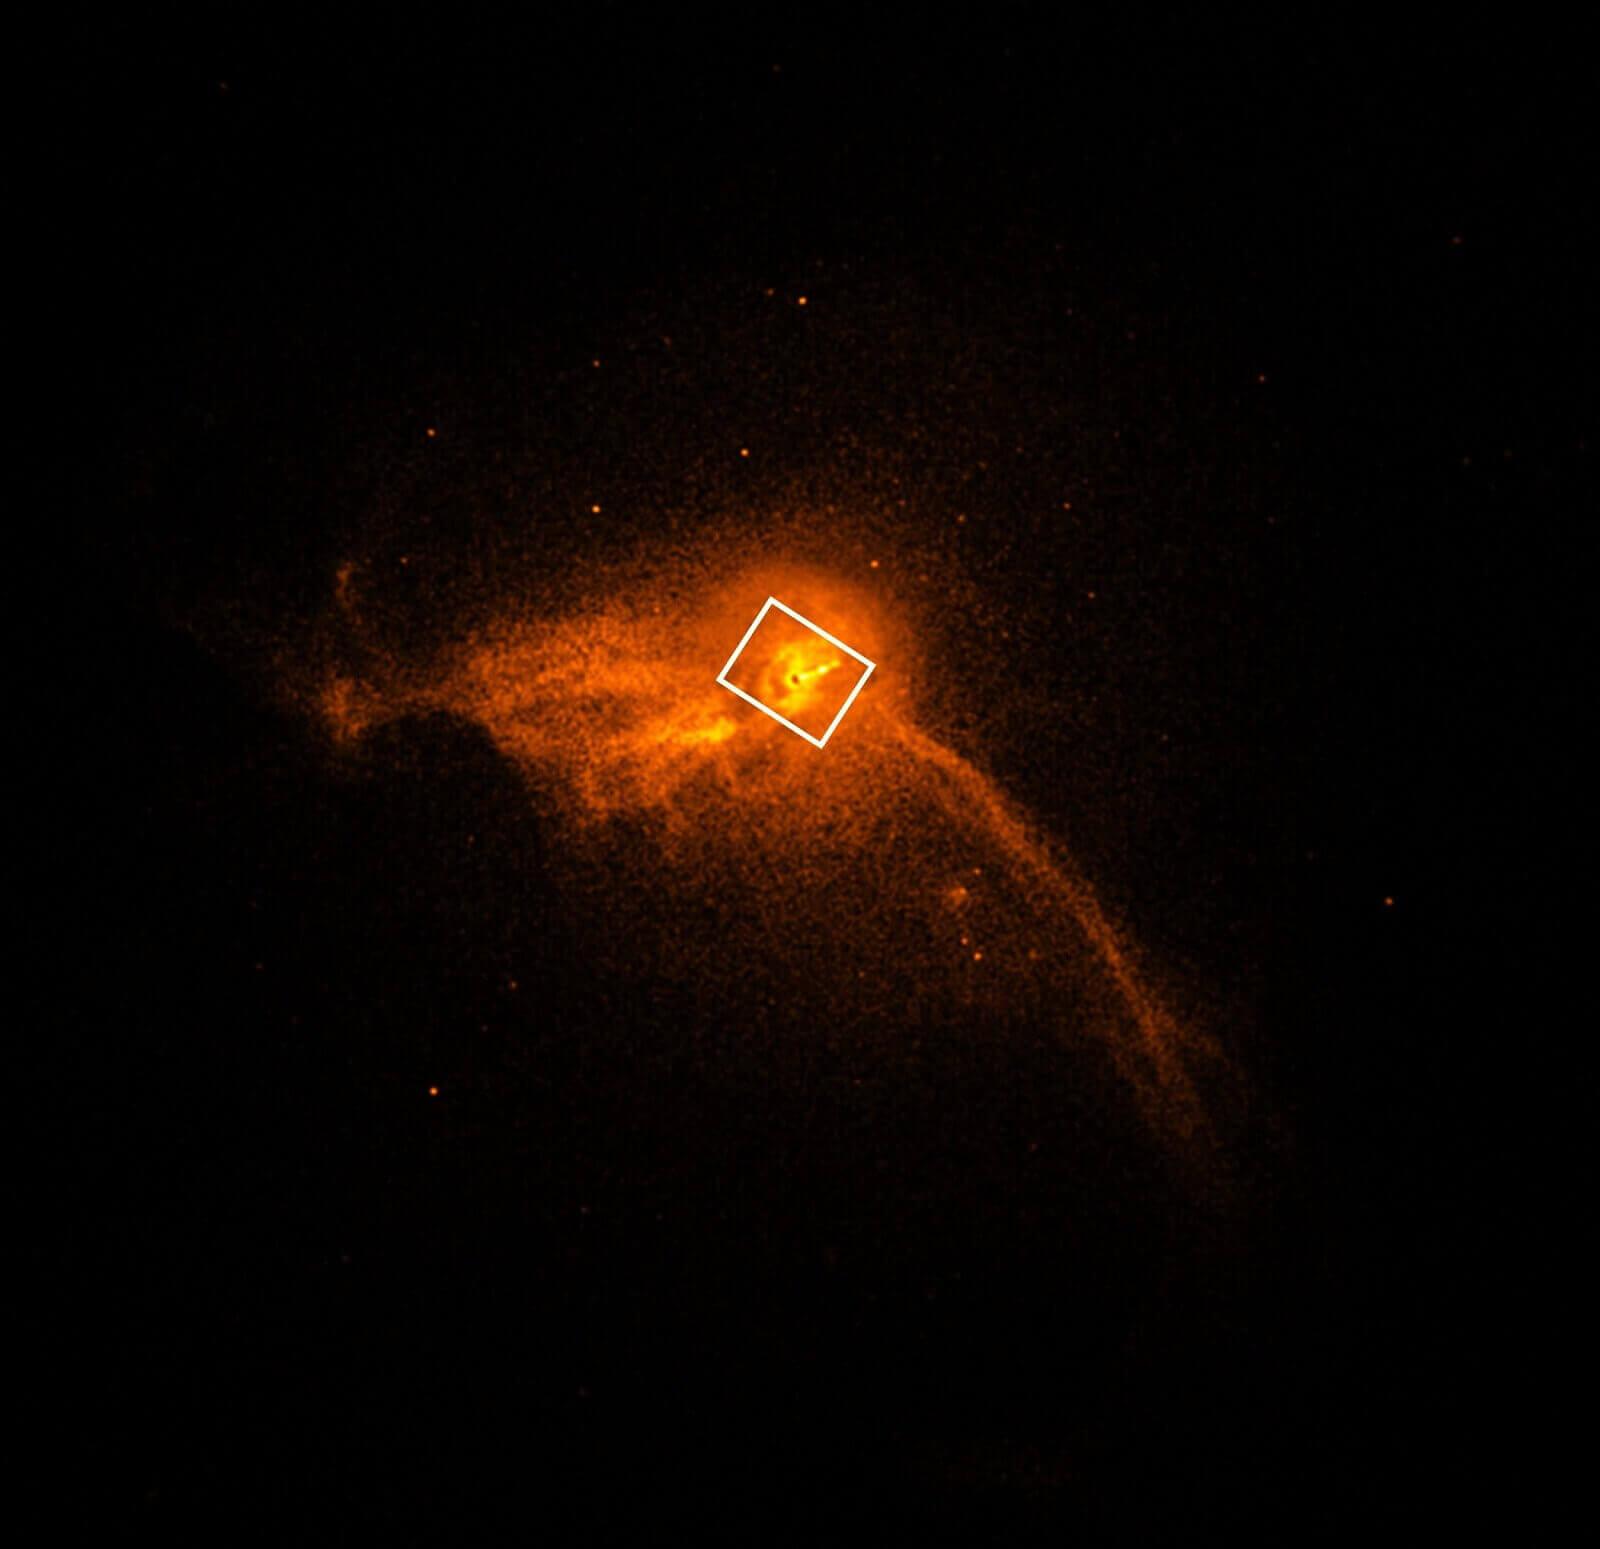 Interstellar Explained - Black Hole Messier 87